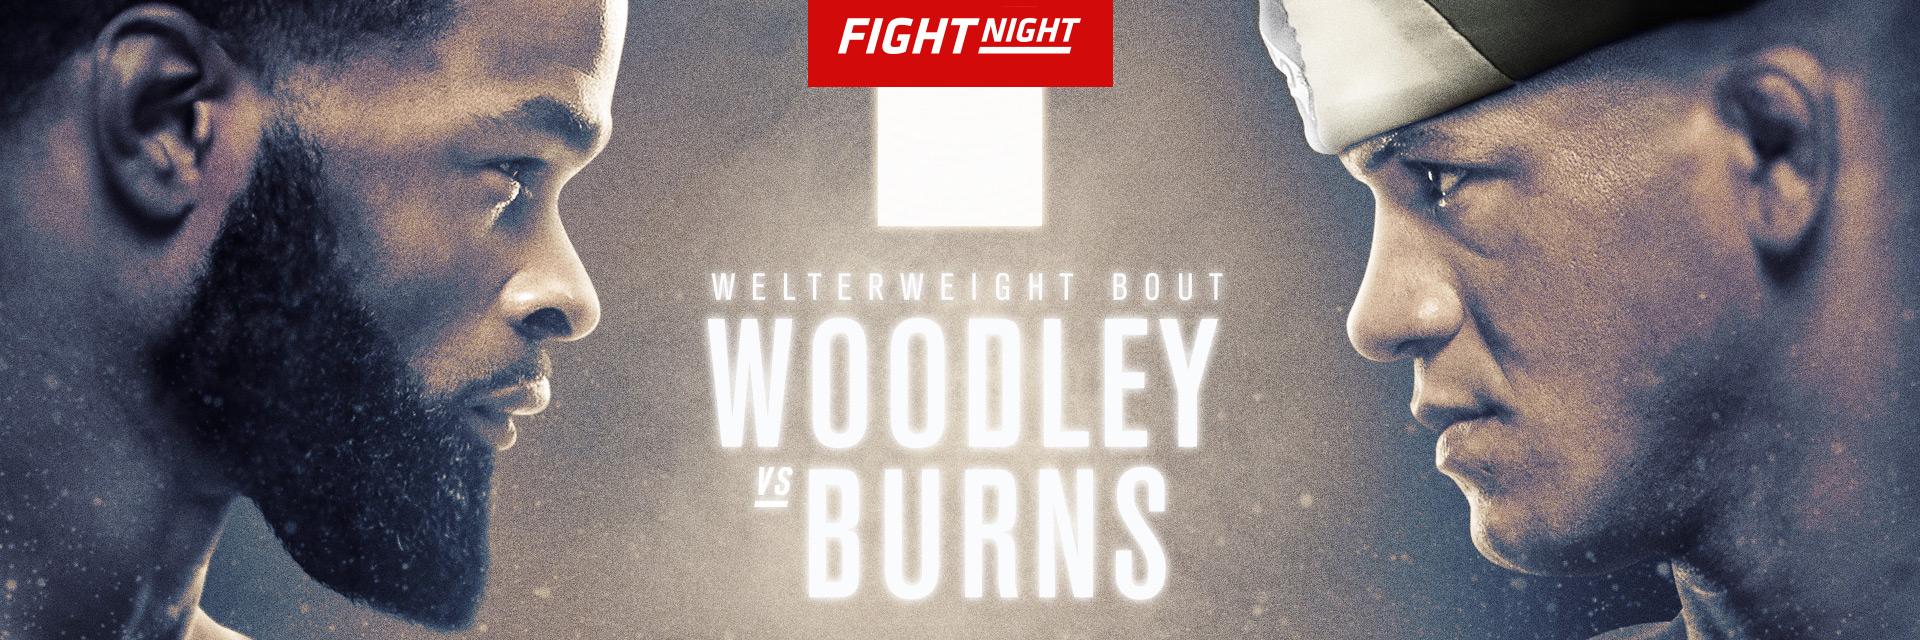 UFC Fight Night: UFC on ESPN 9 Woodley vs Burns